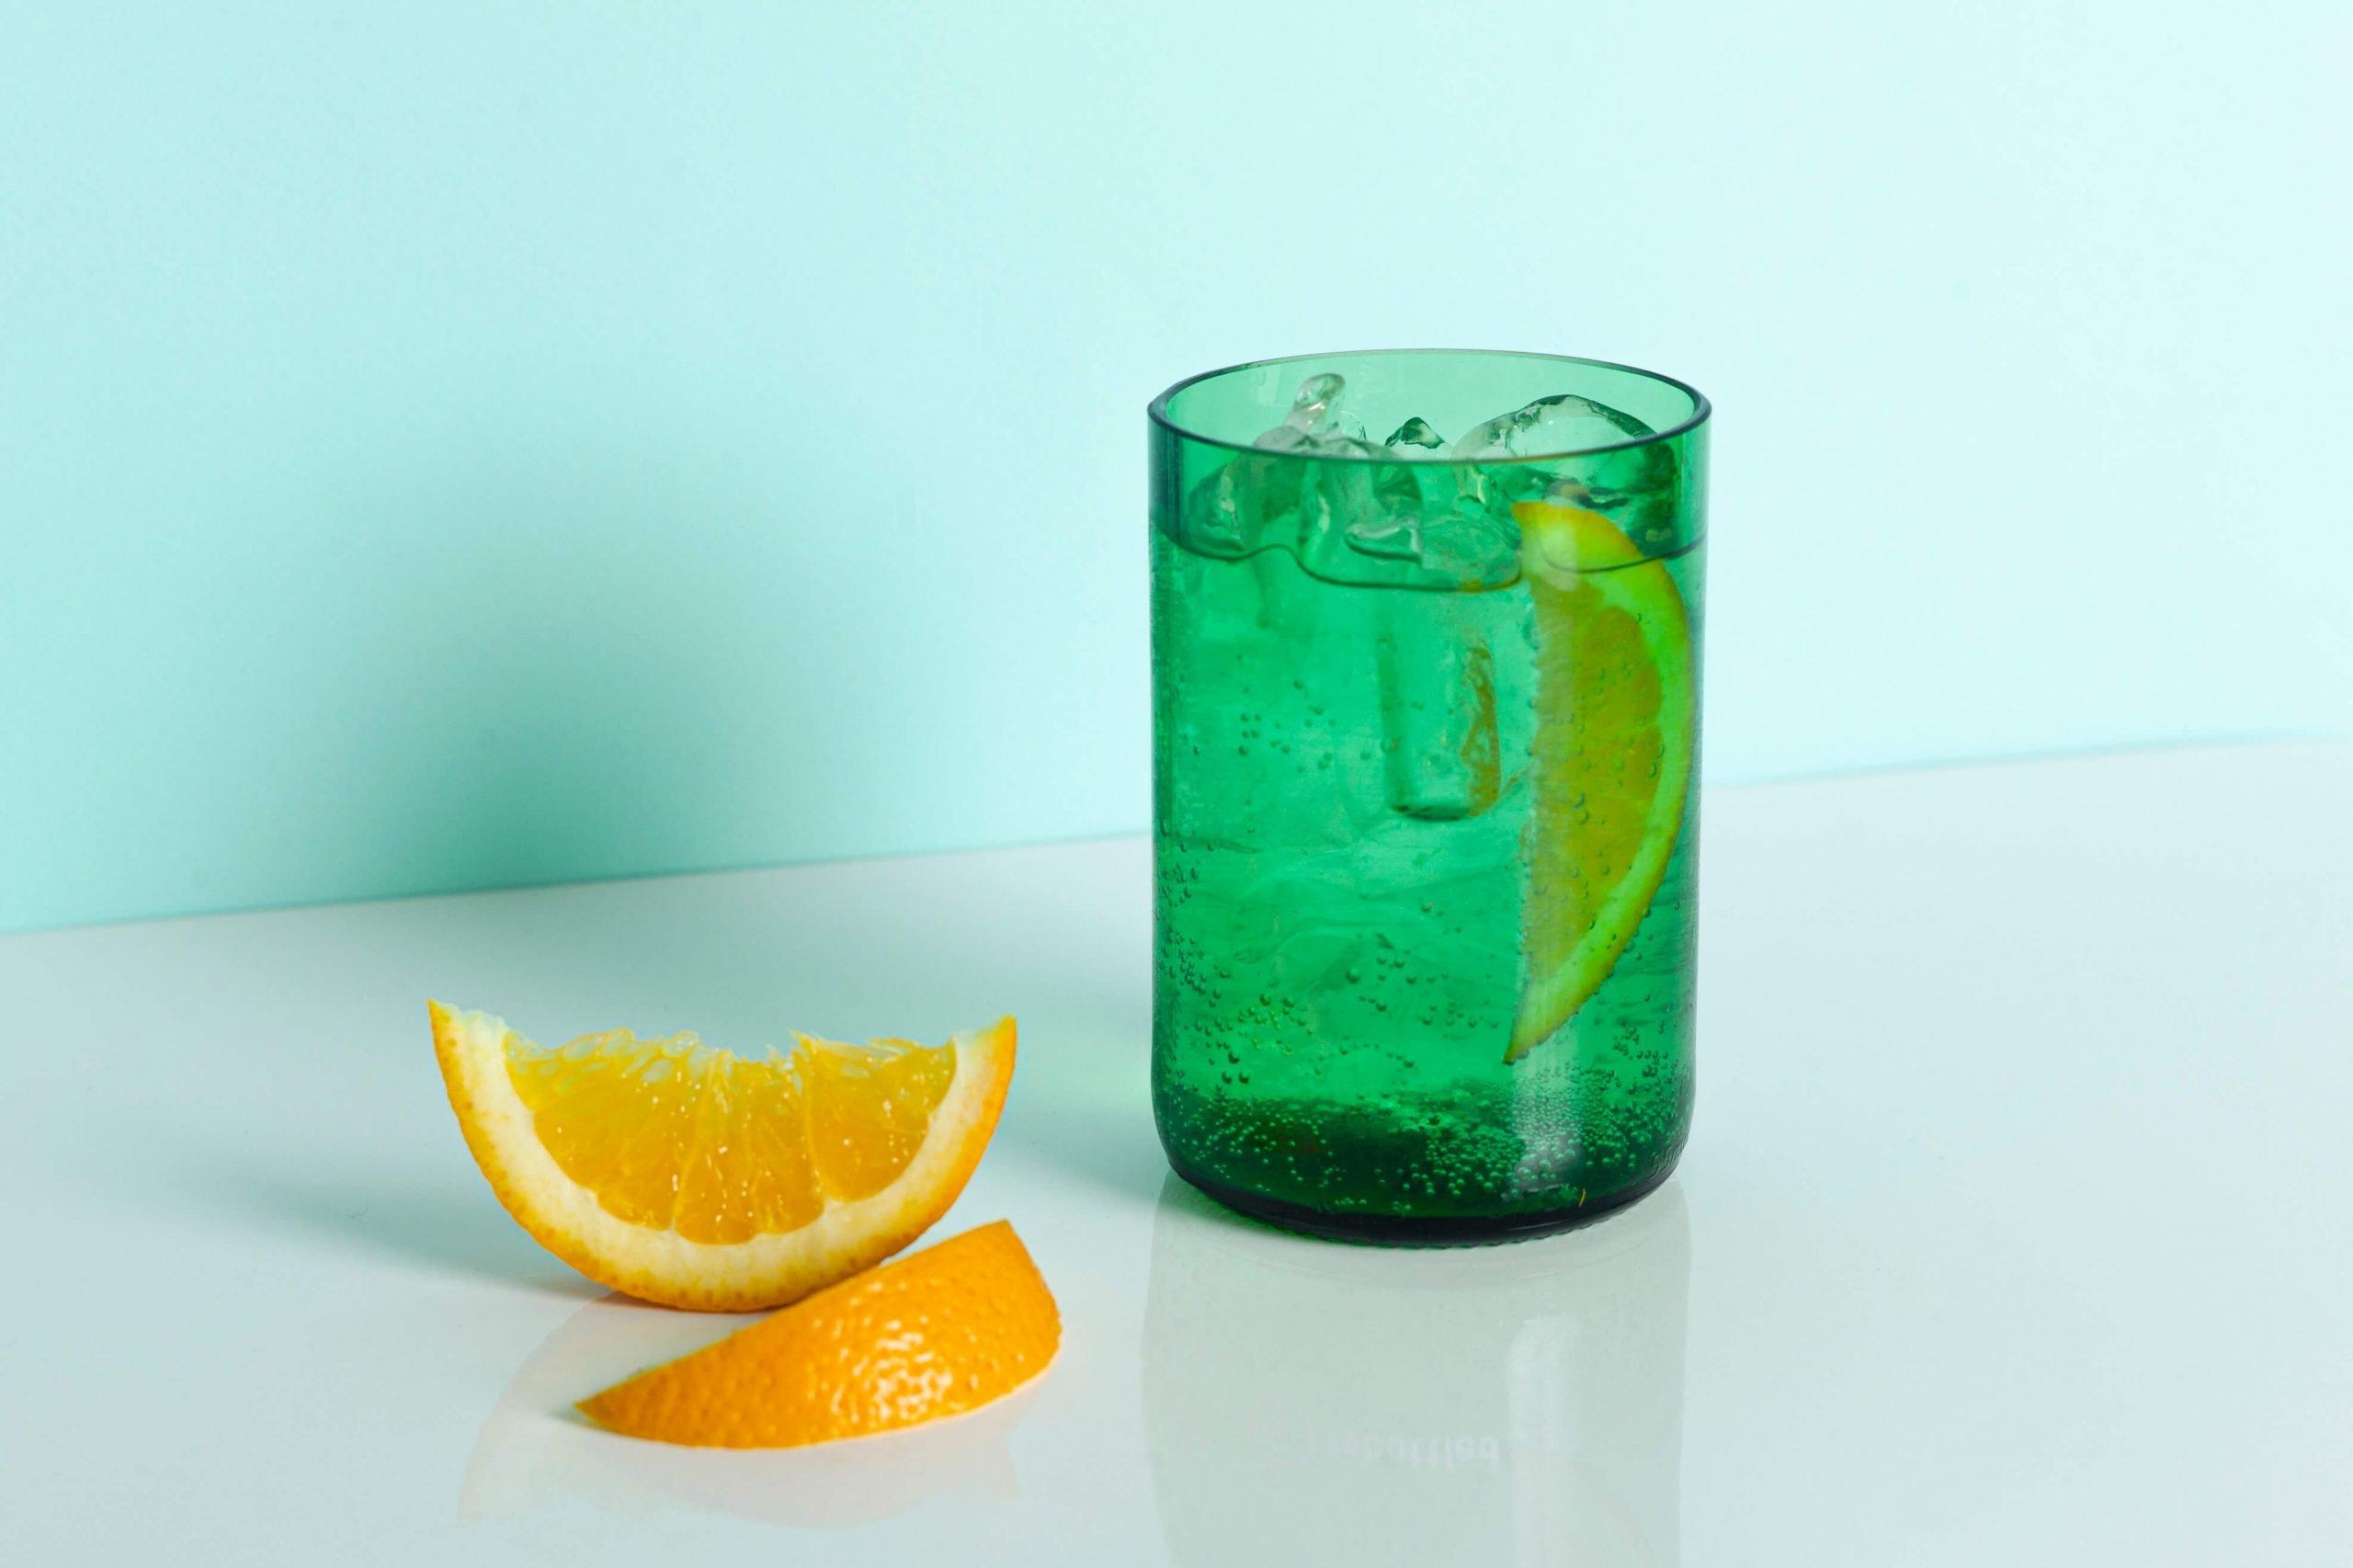 Rebottled groen glas met sinaasappel schijfjes